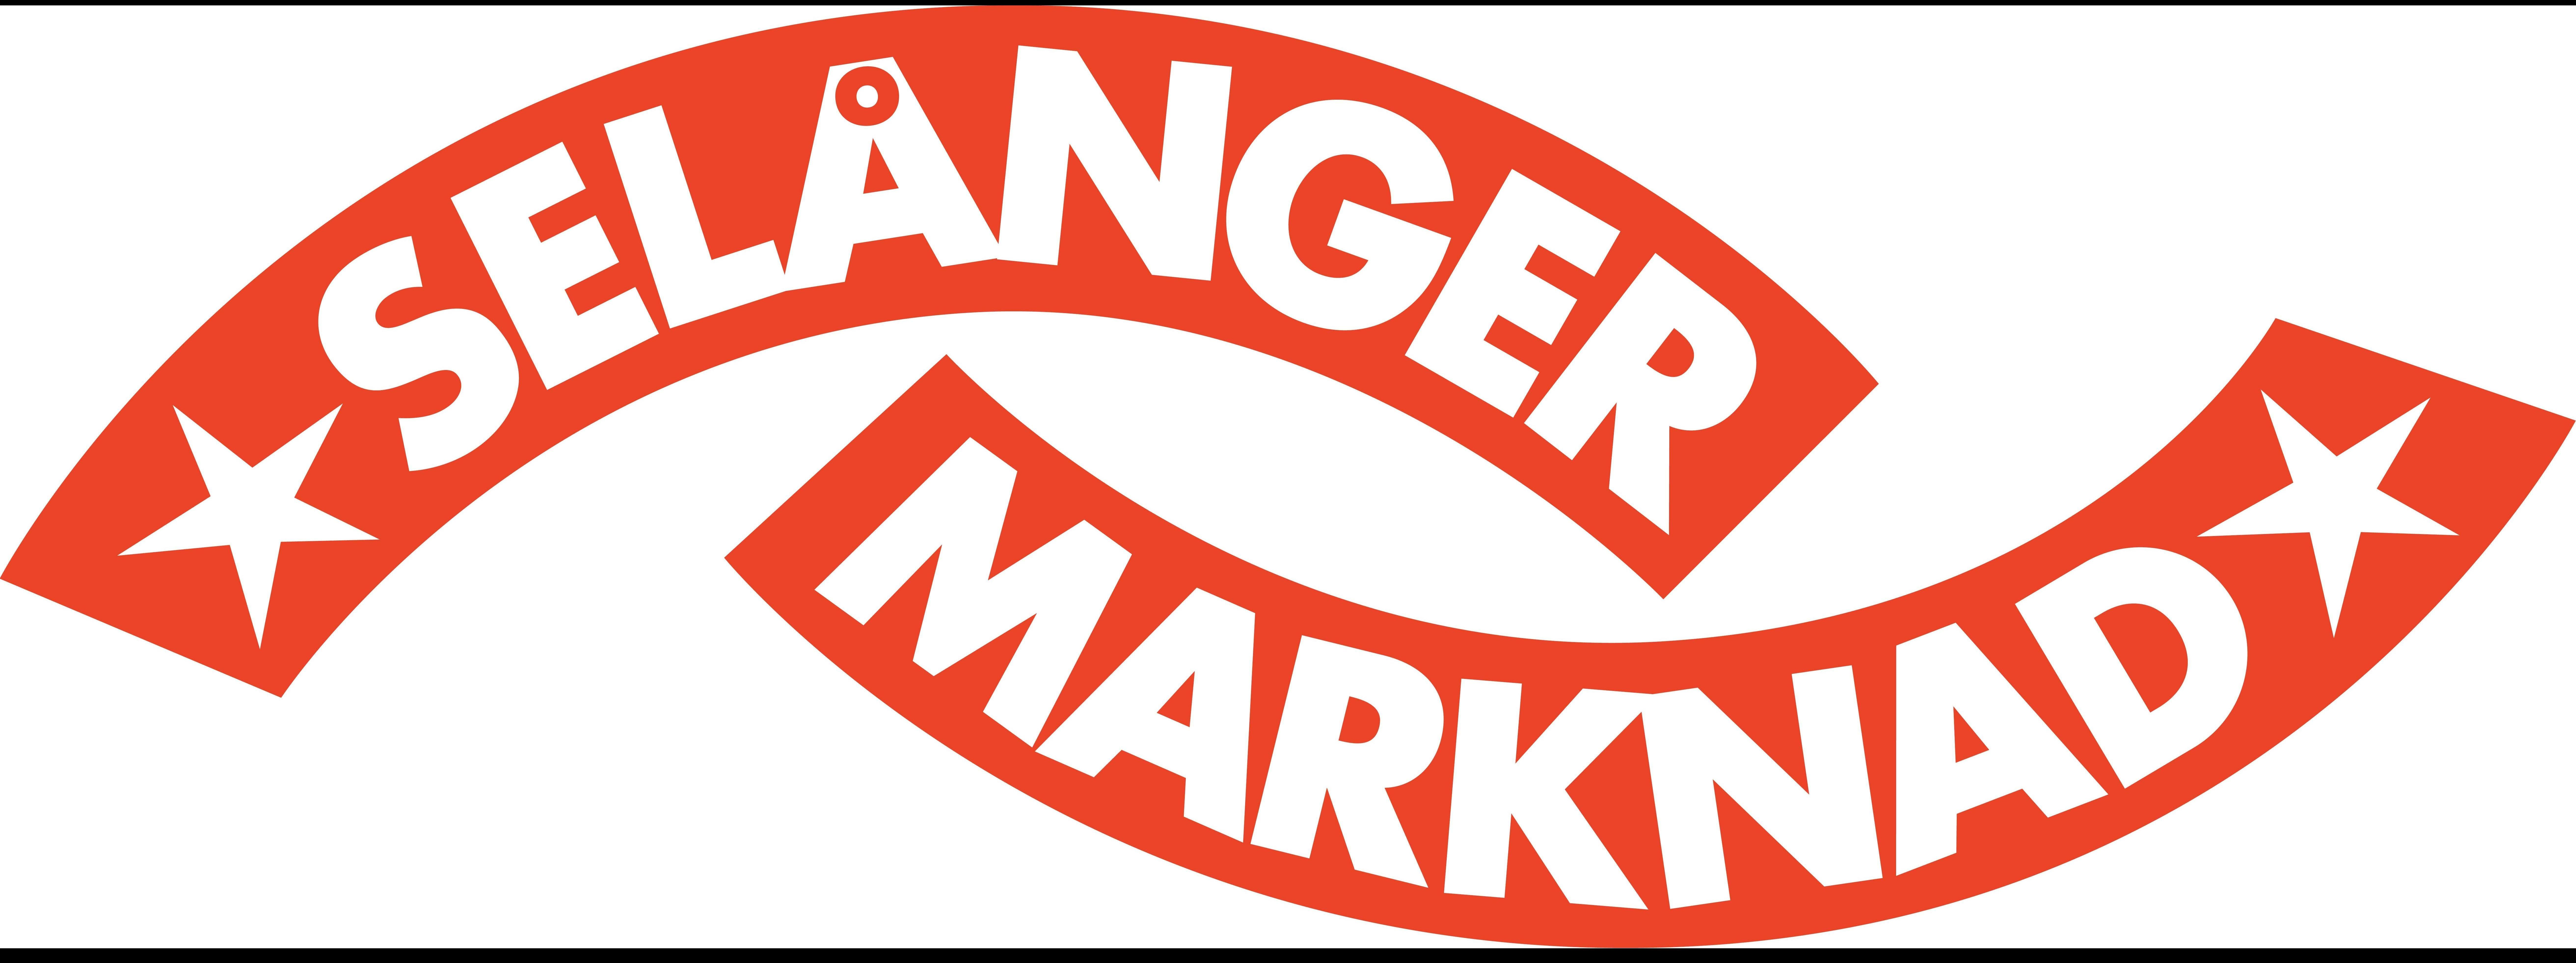 Selånger Marknad - Selånger Market